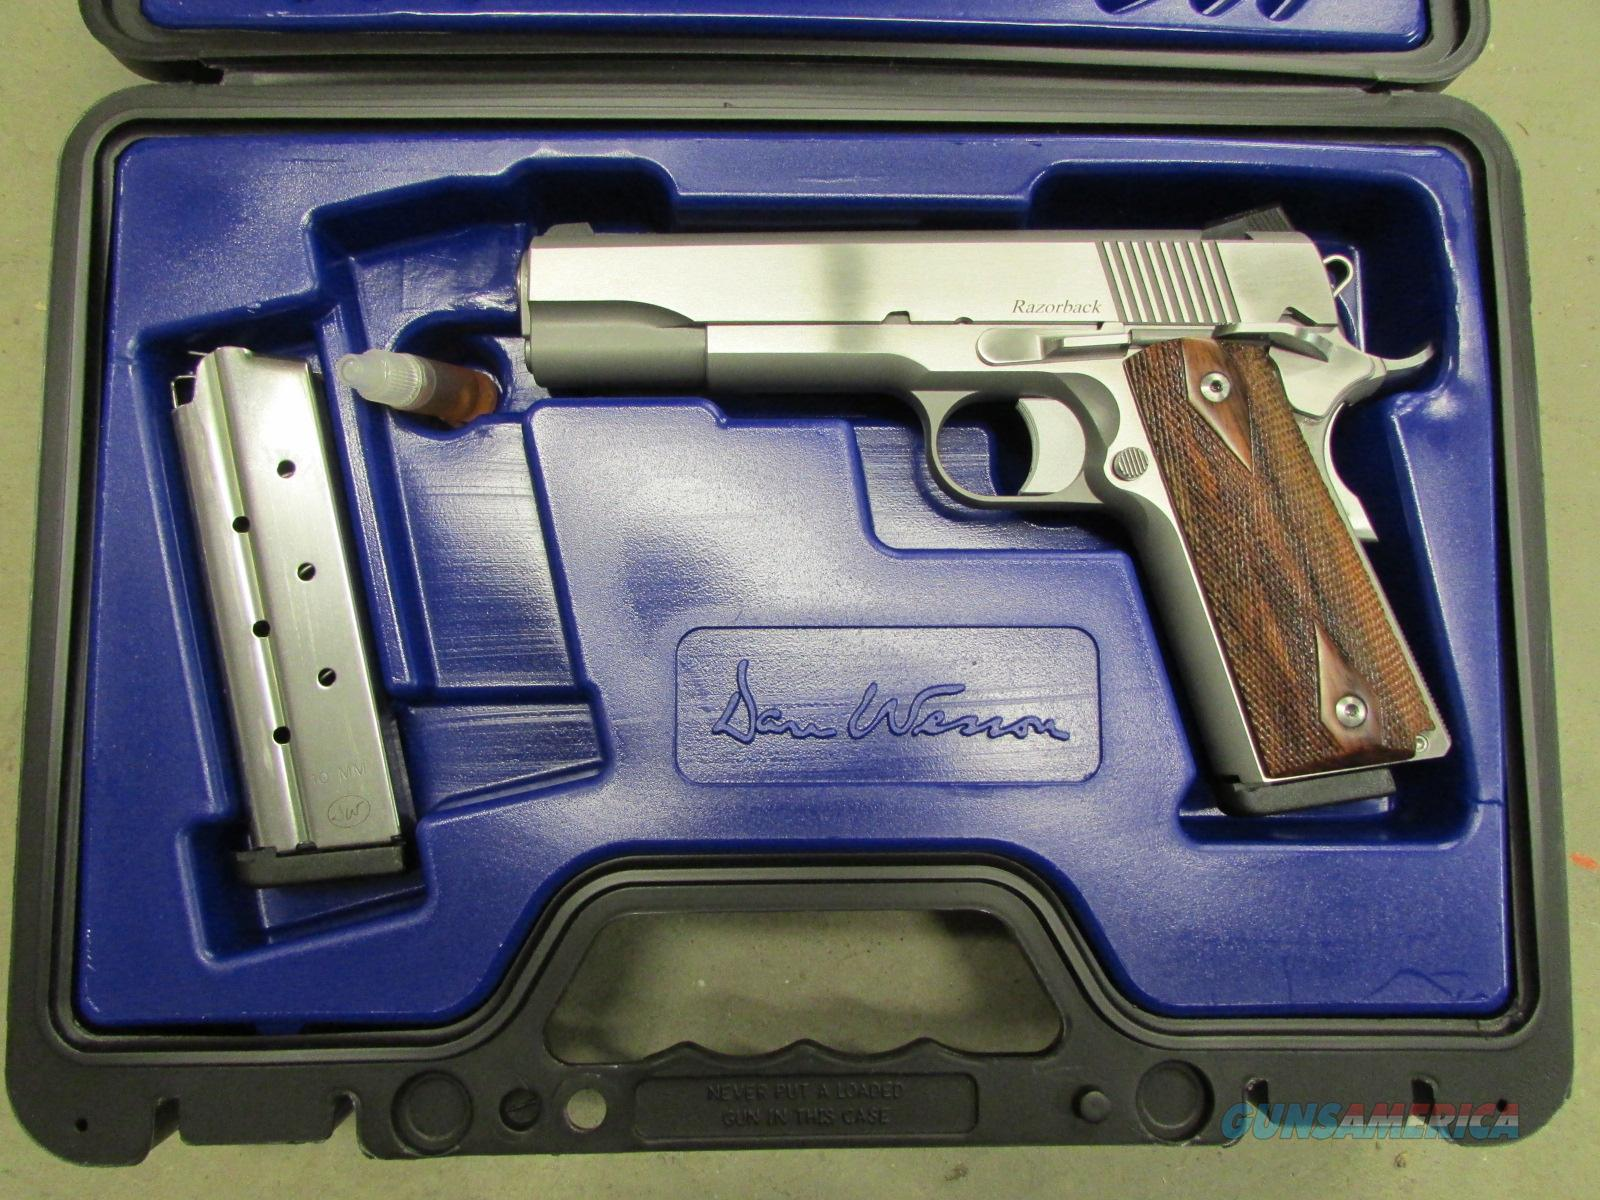 CZ-USA Dan Wesson Razorback Stainless 1911 Wood Grips 10mm